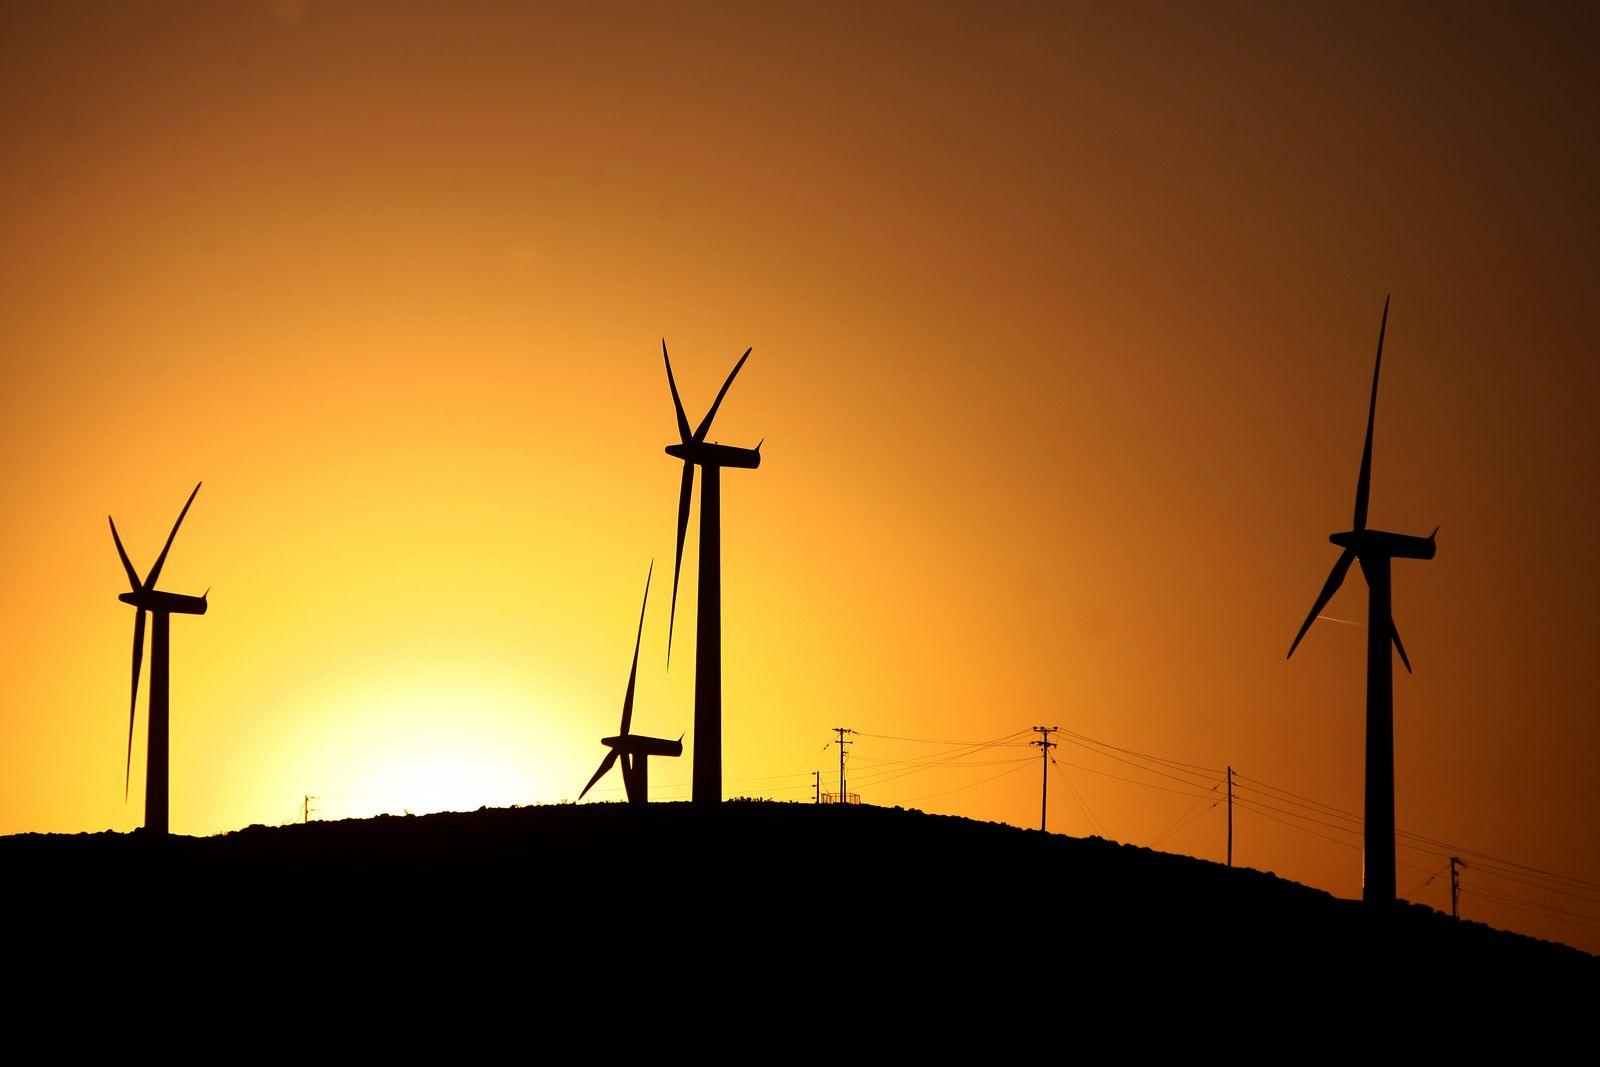 Griechenland / Kyoto Protokoll / Windkraft